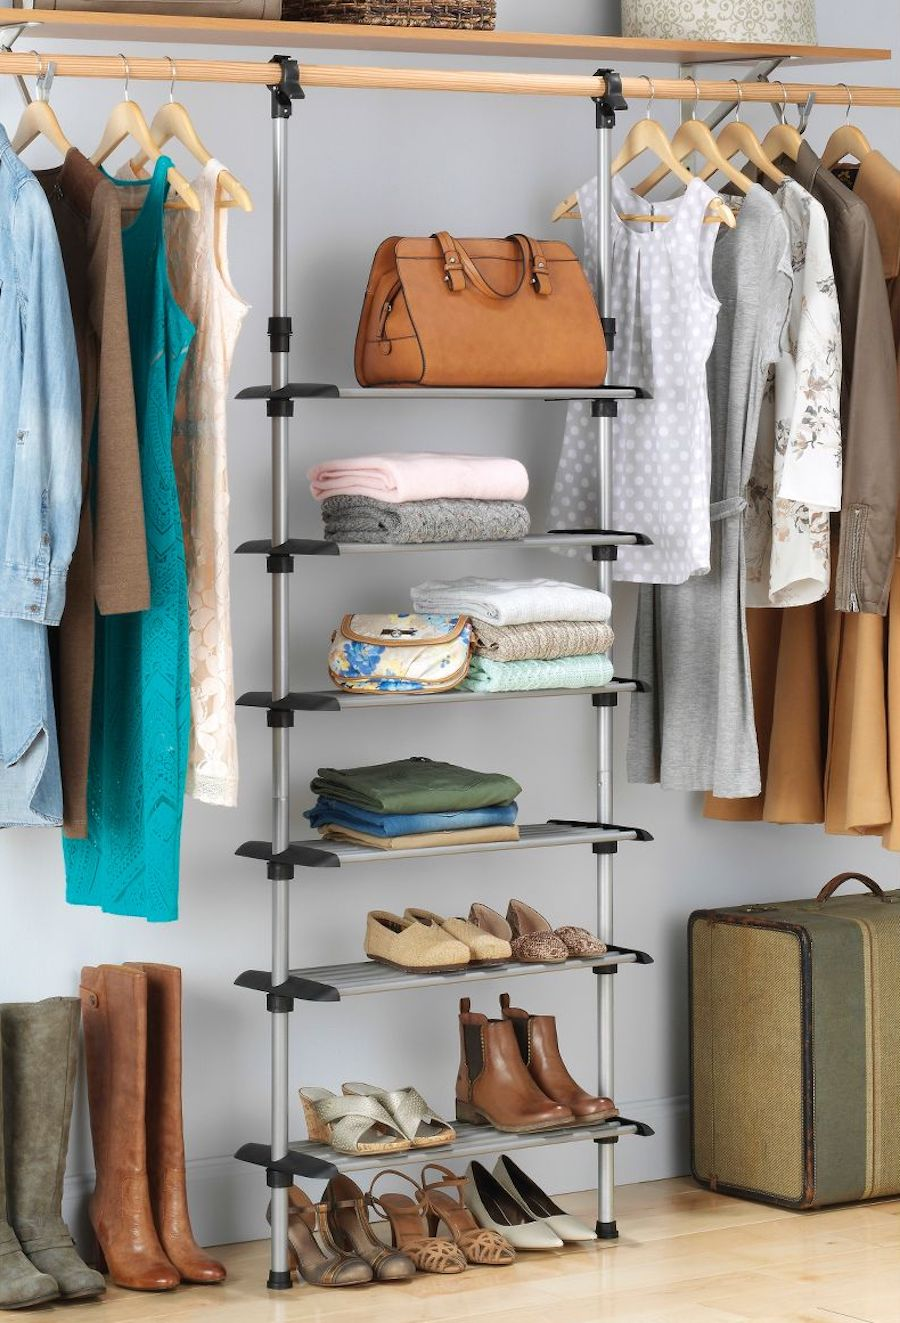 Shoe Rack hanging inside organized closet